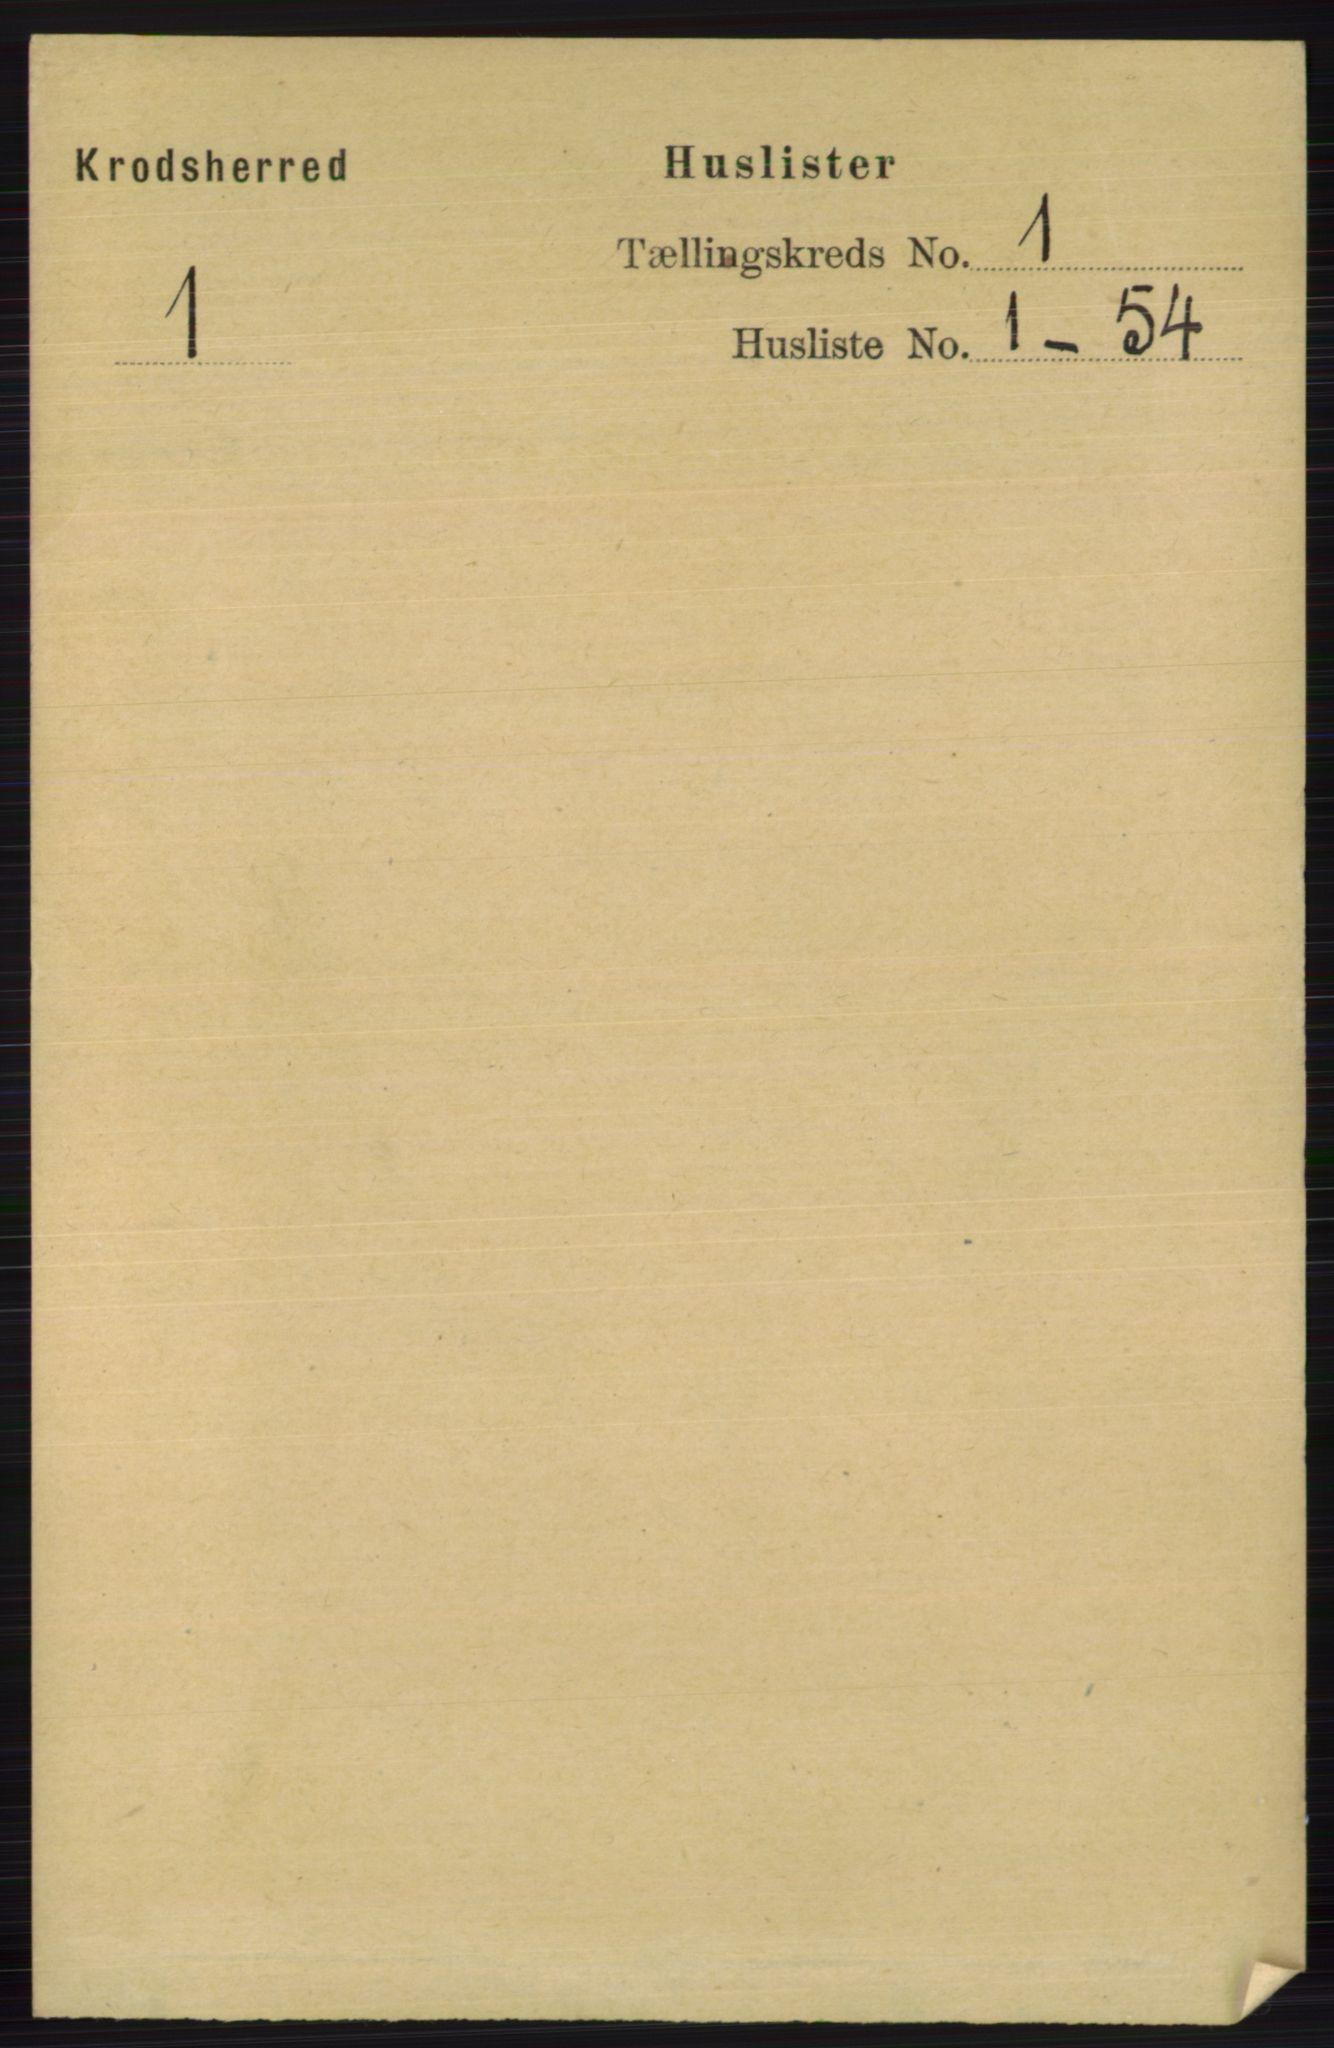 RA, Folketelling 1891 for 0621 Sigdal herred, 1891, s. 4919